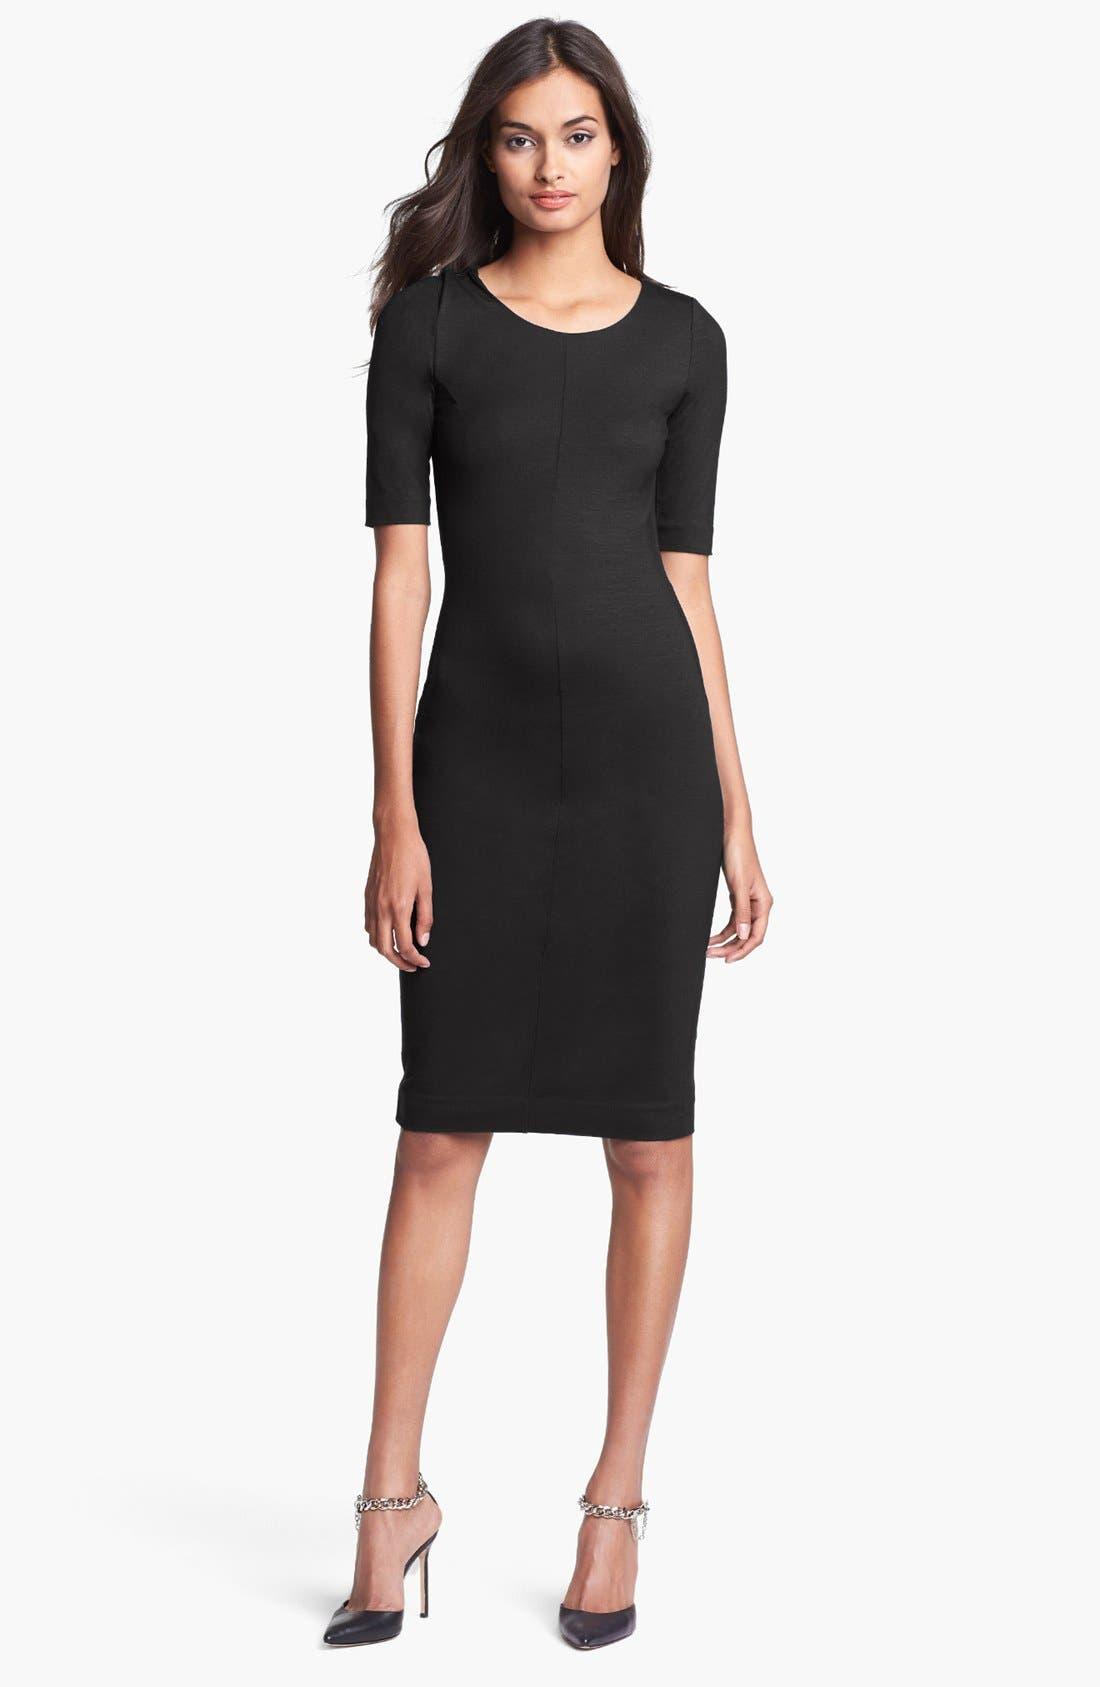 Alternate Image 1 Selected - Diane von Furstenberg 'Raquel' Knit Sheath Dress